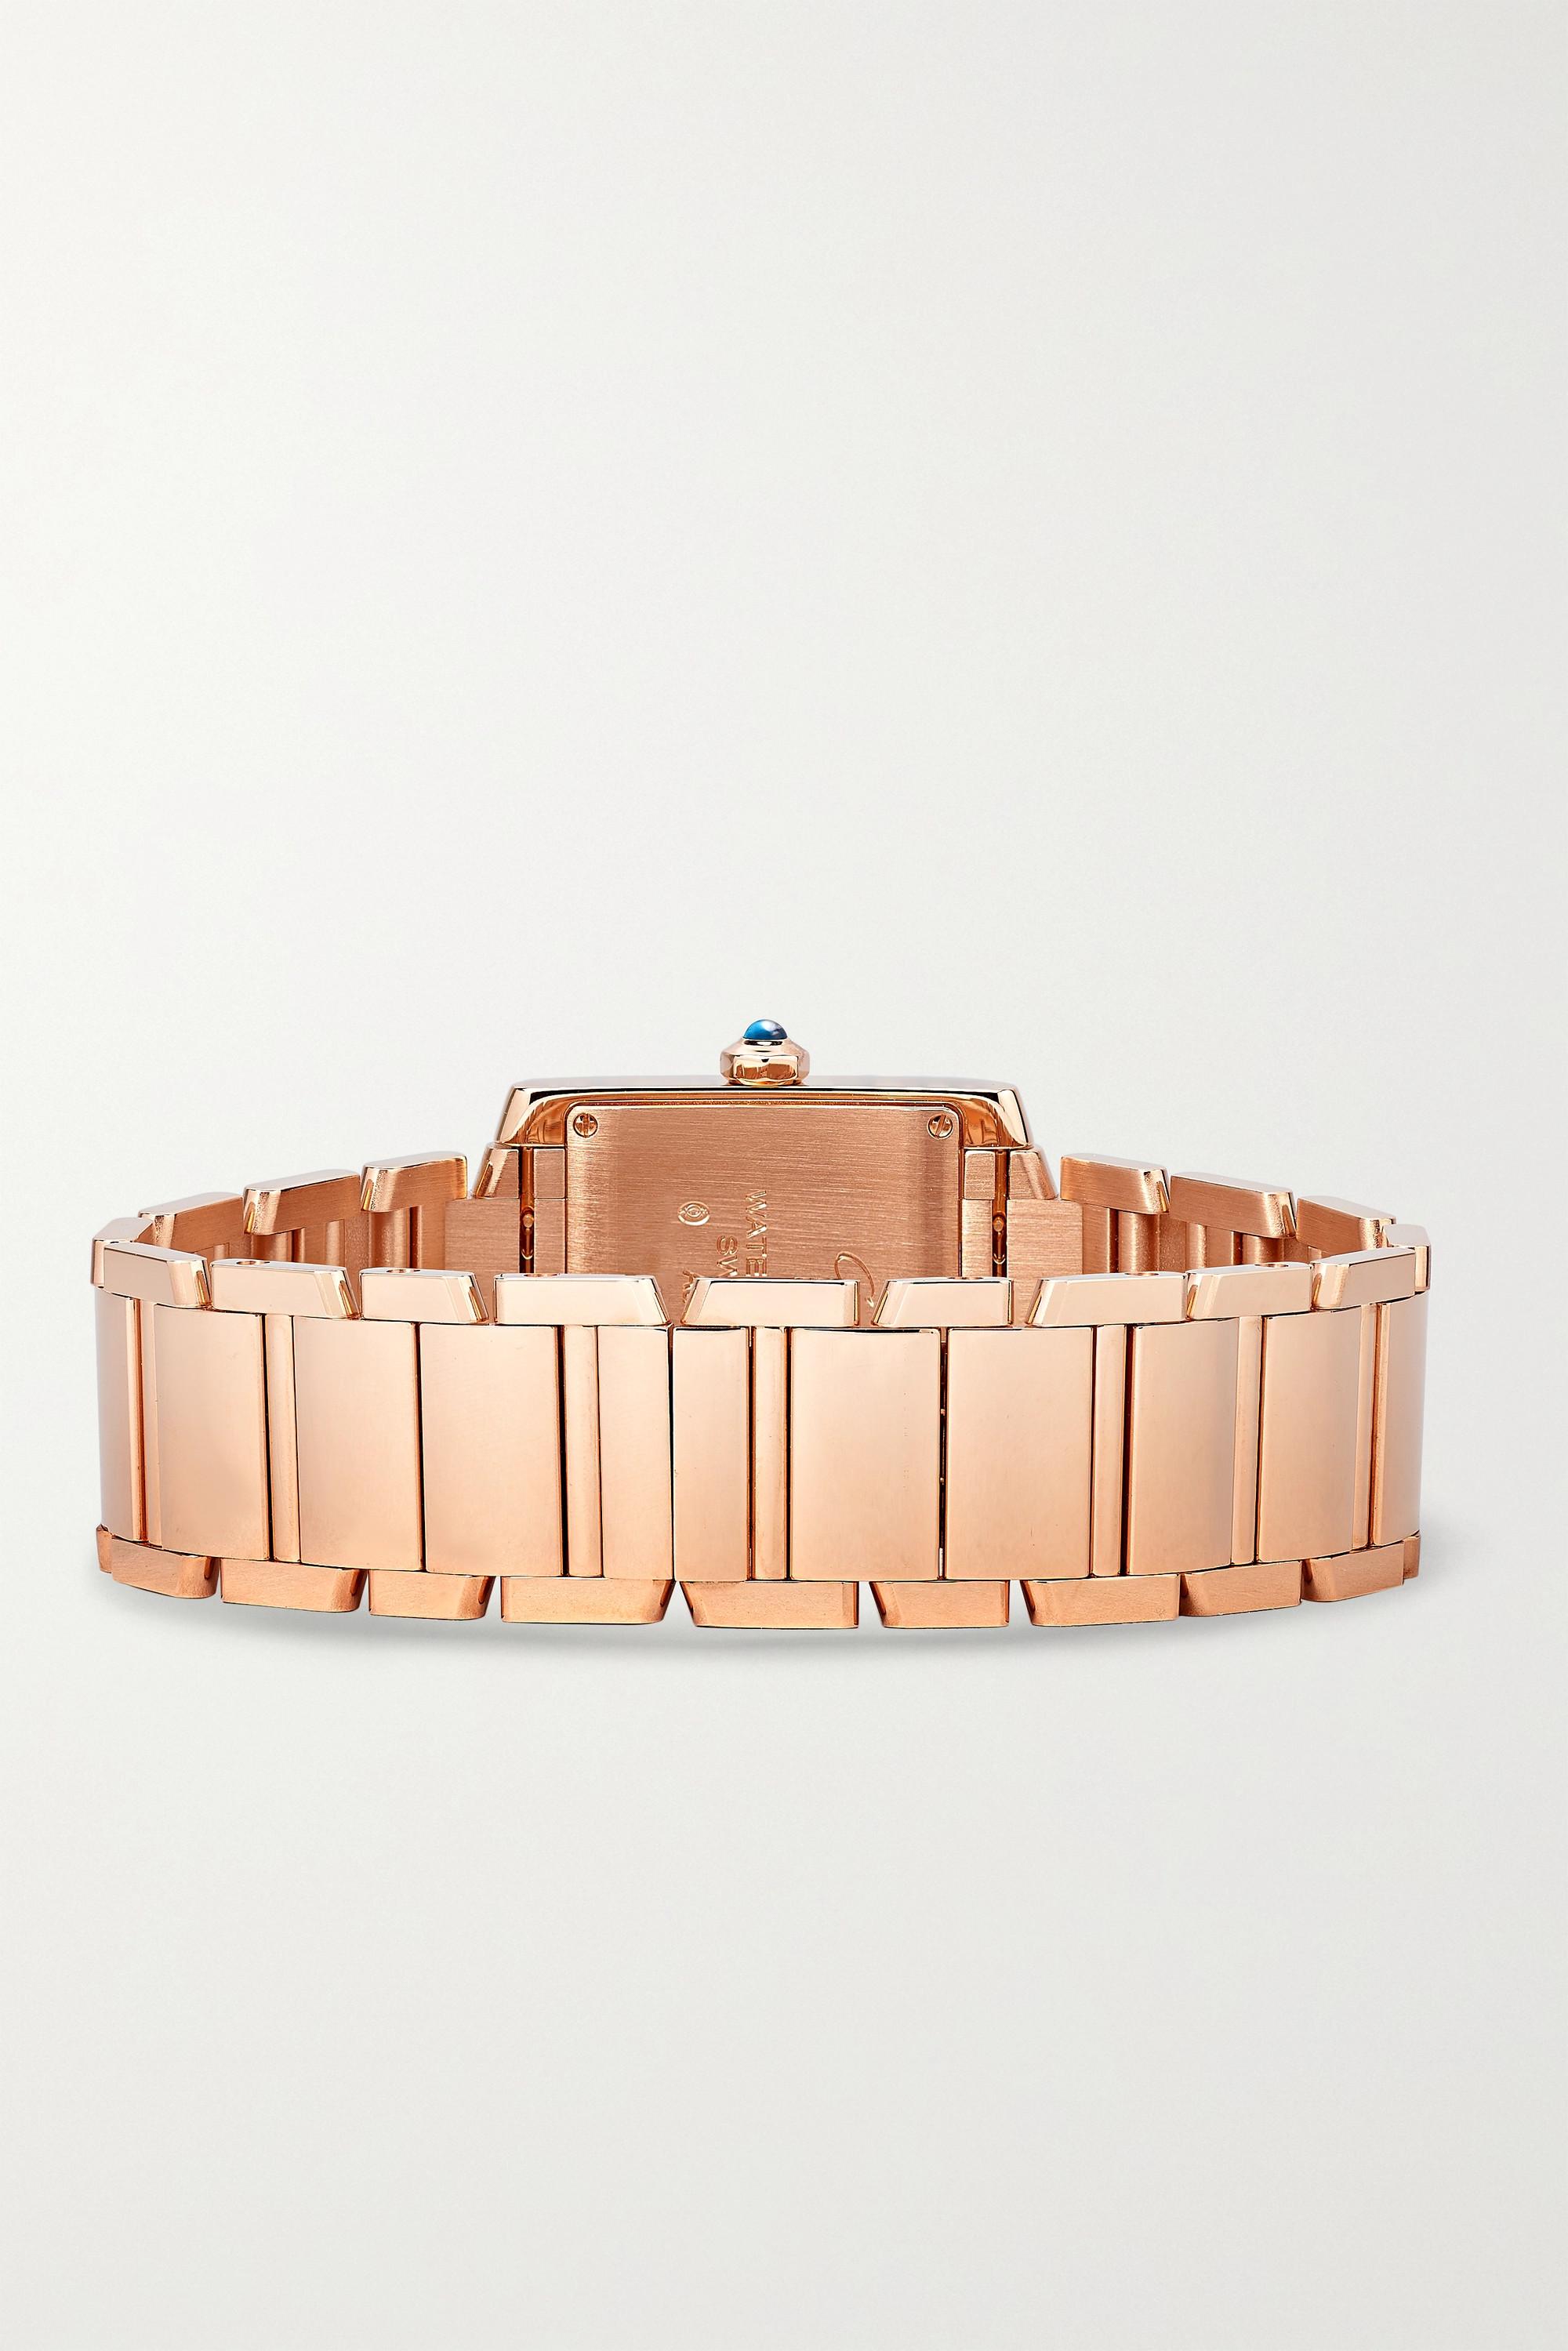 Cartier Montre en or rose 18 carats Tank Française Medium 30 mm